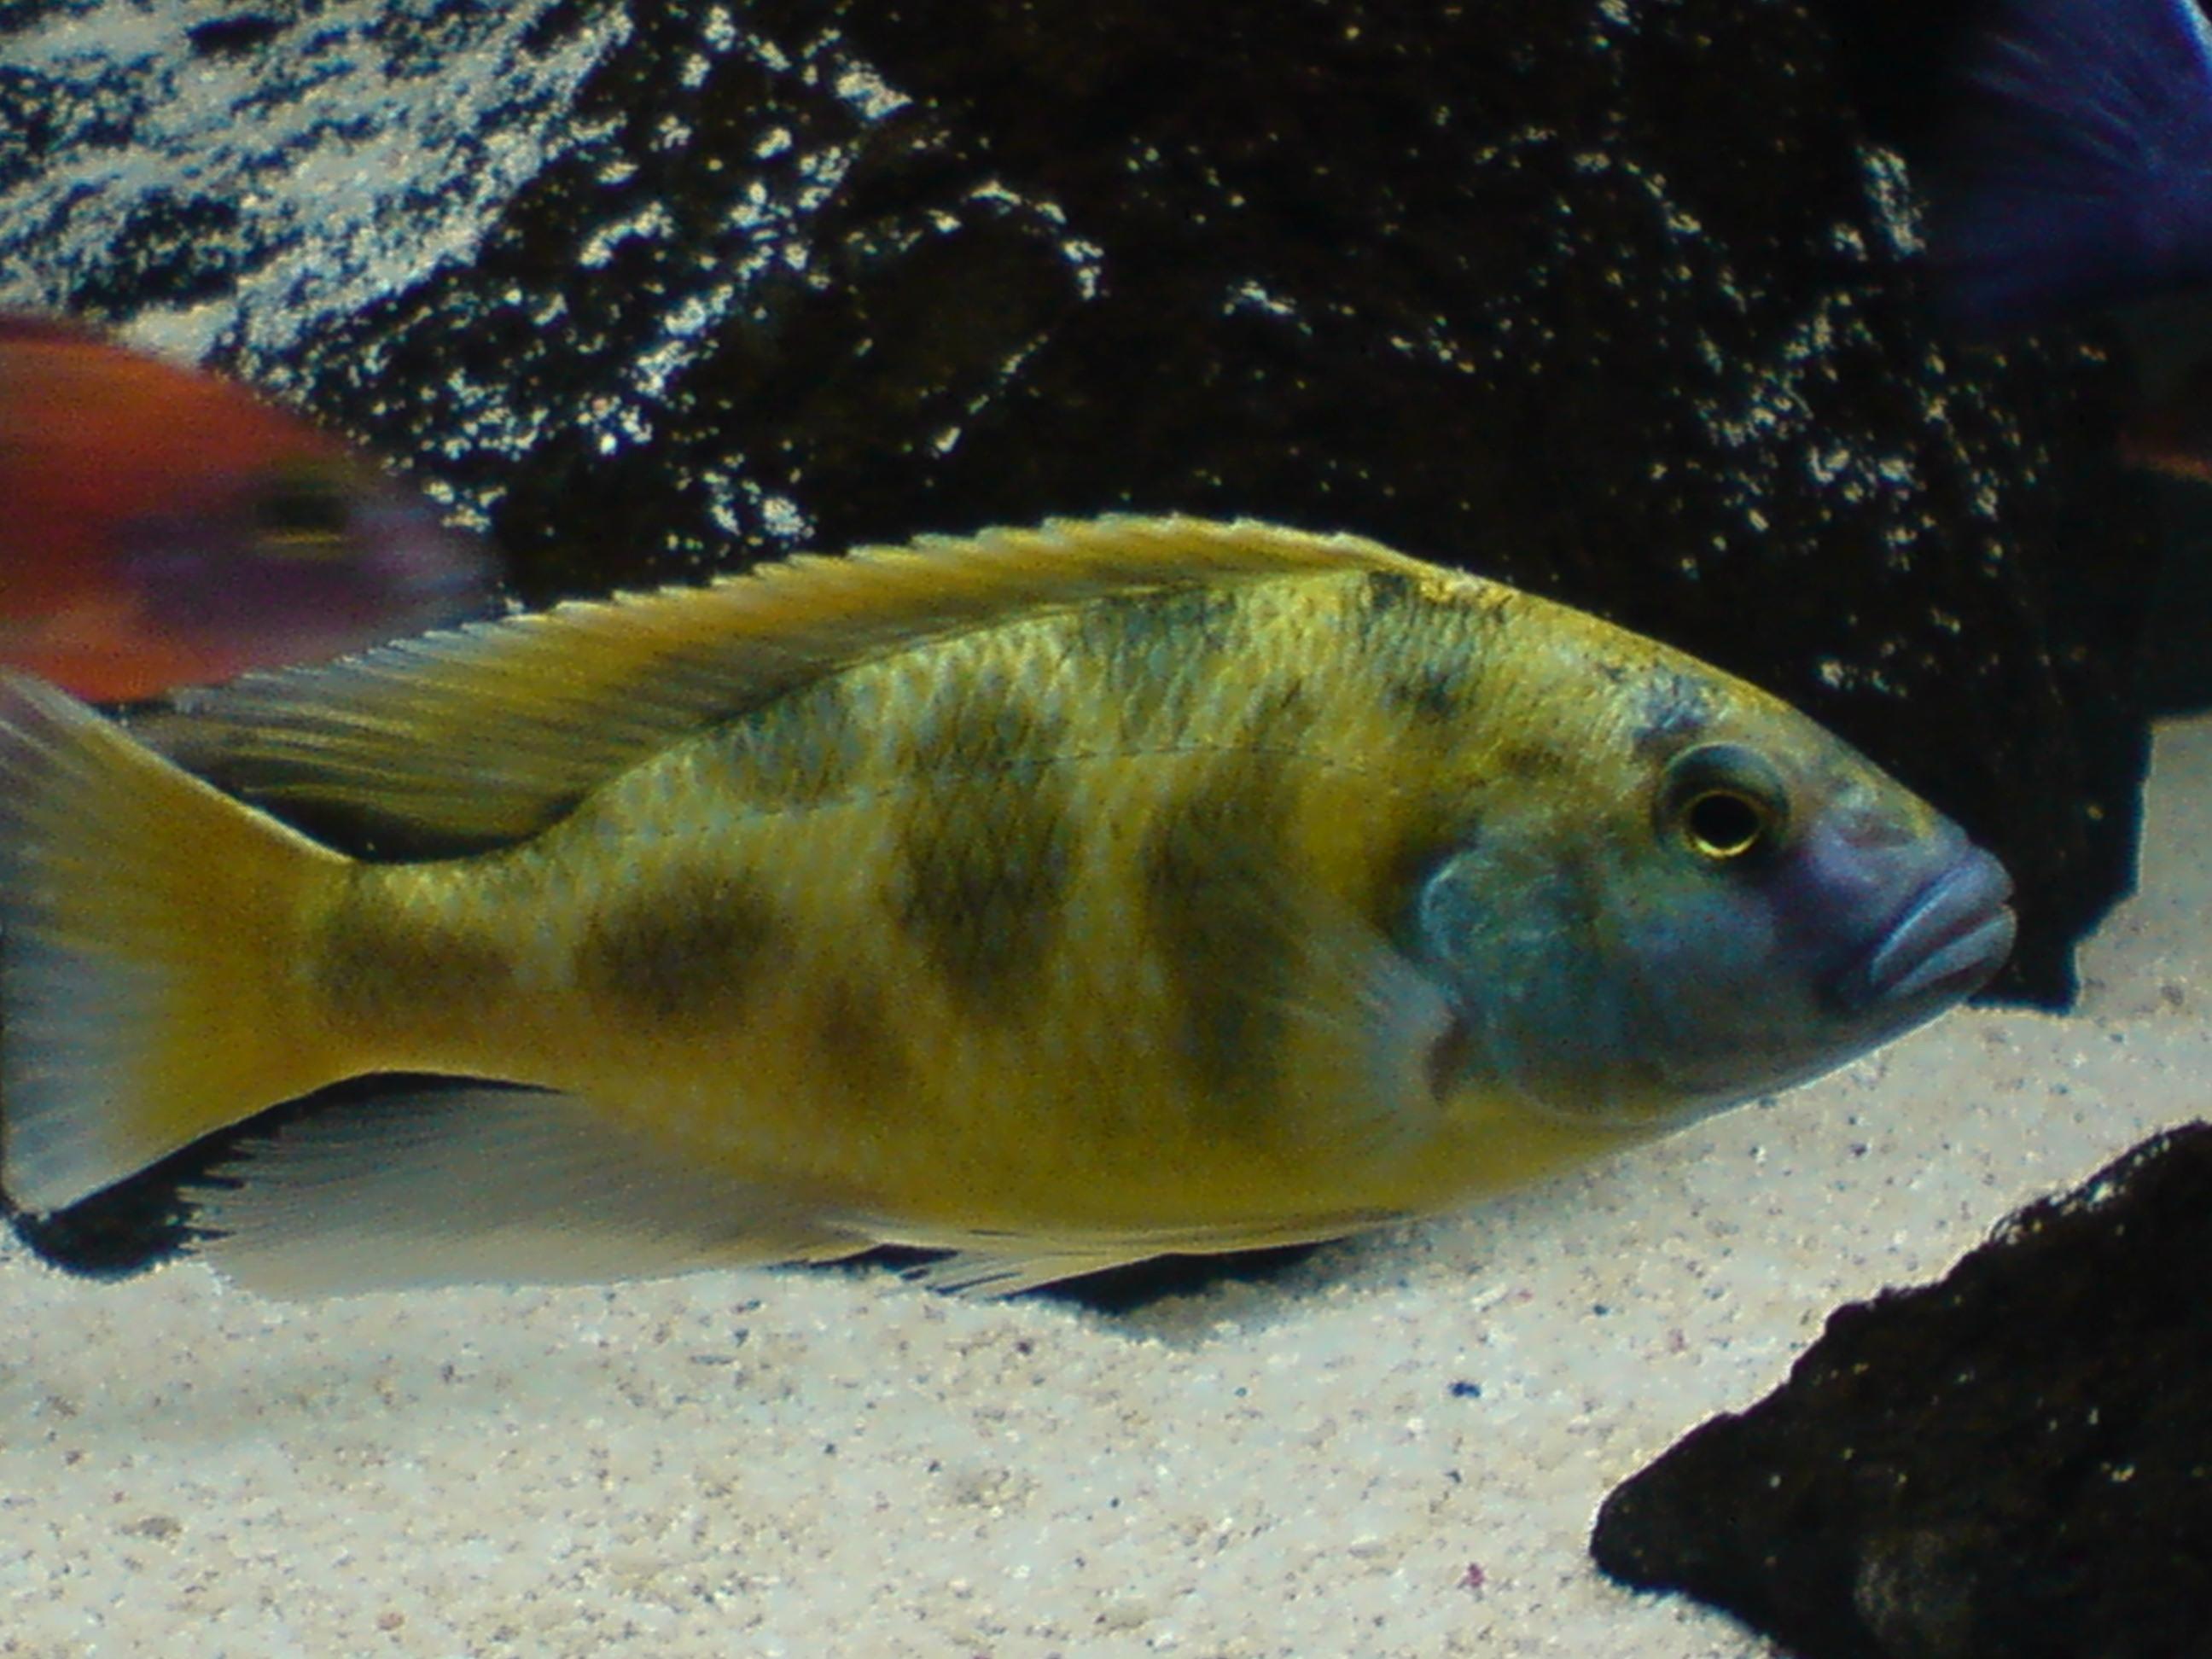 Venustus Hap : Venustus+Cichlid cichlids.com: Nimbochromis Venustus